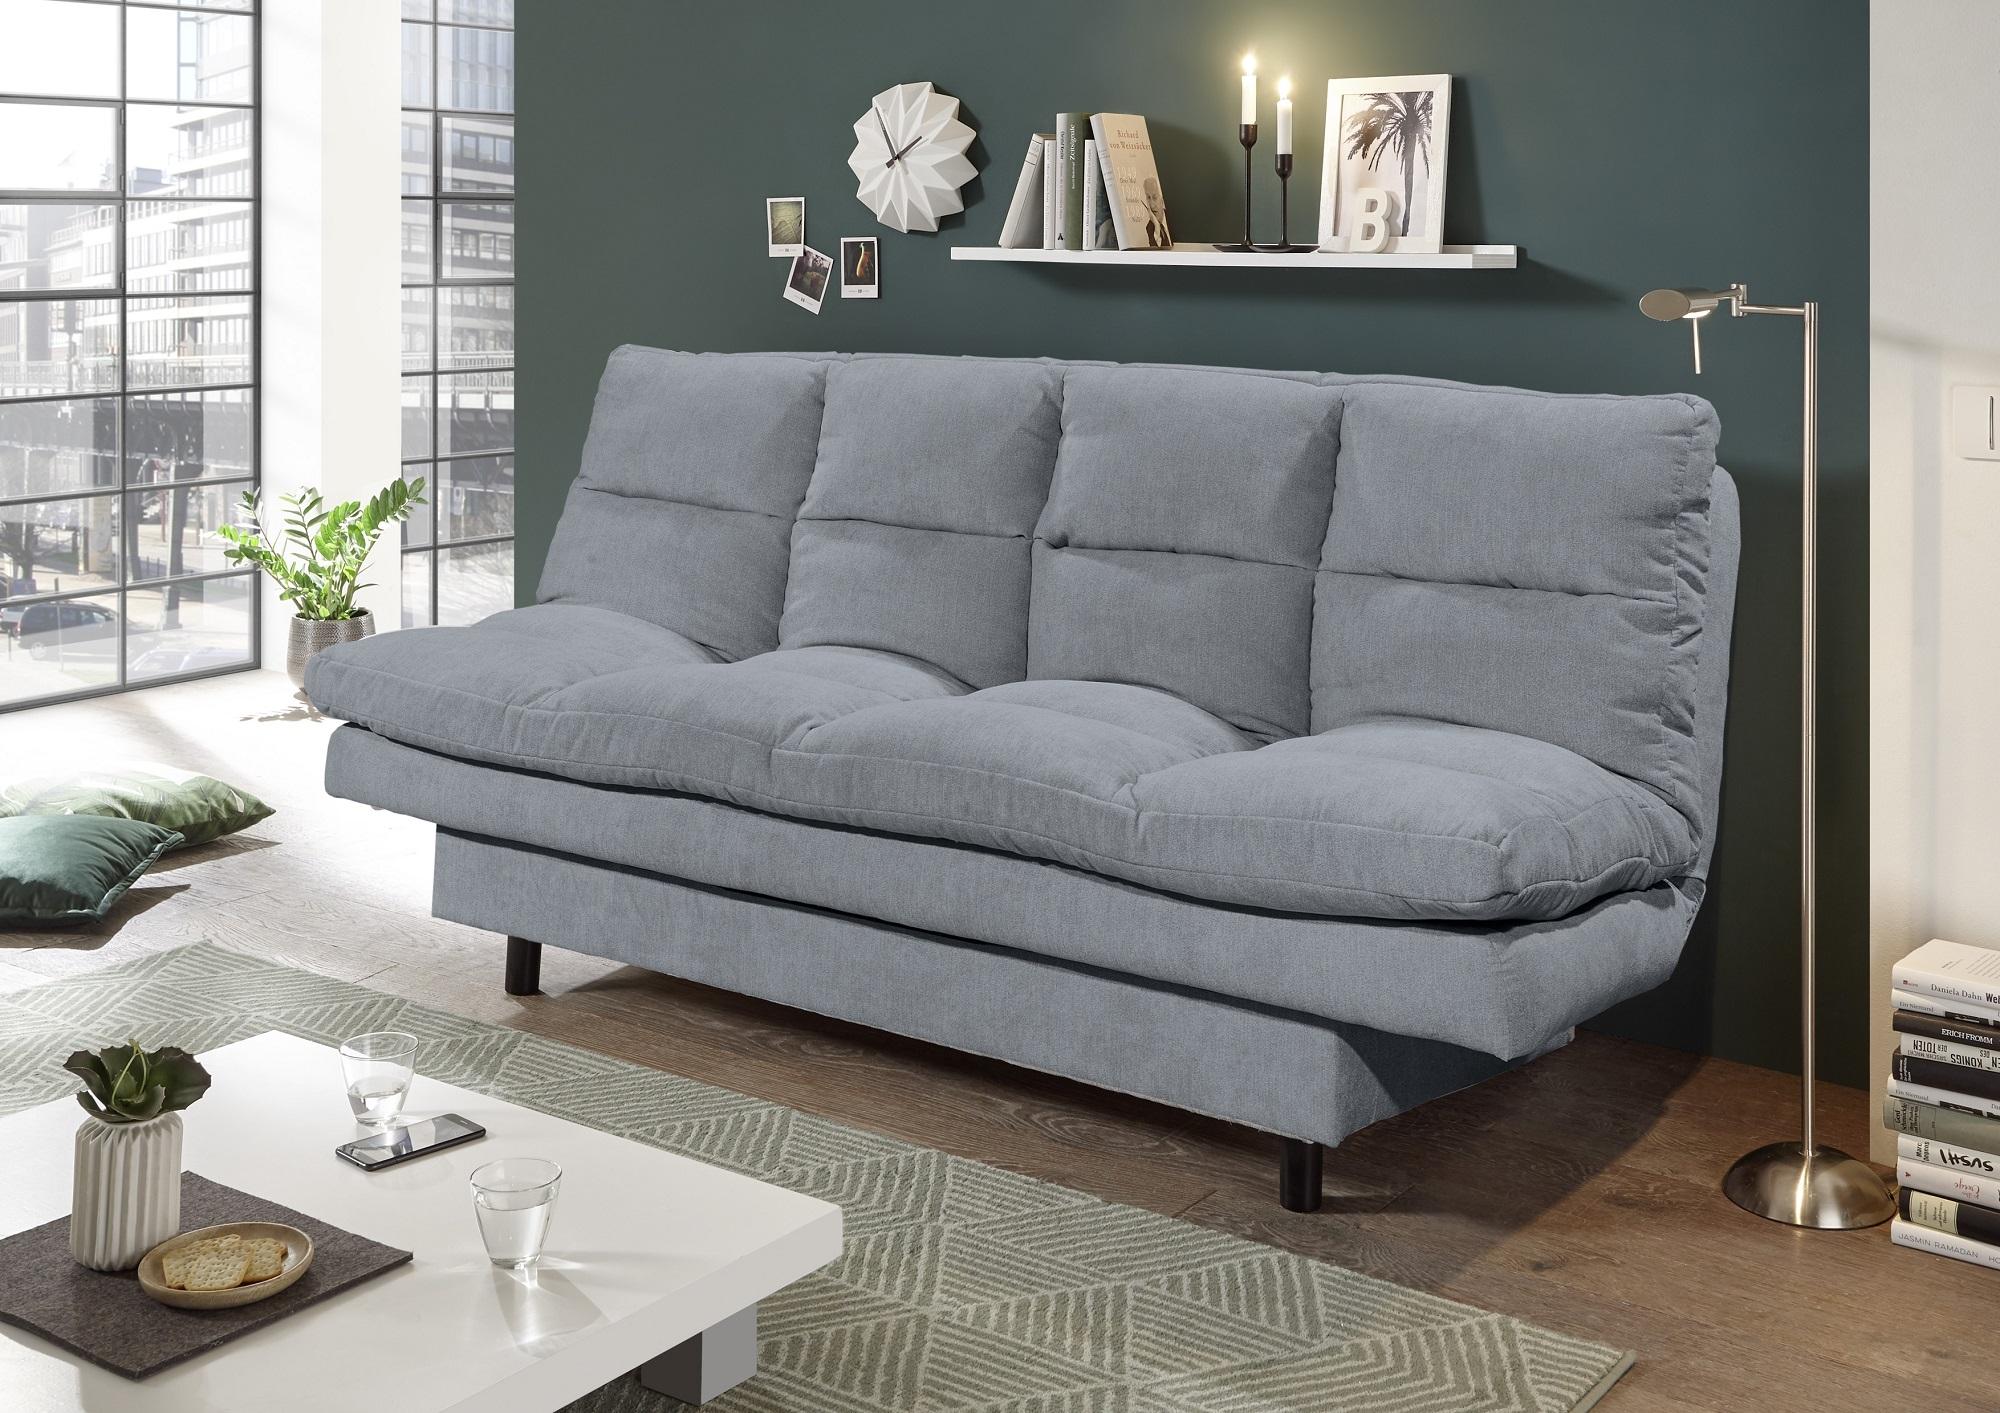 Canapea extensibila tapitata cu stofa, 3 locuri Lotta Antracit, l190xA95xH85 cm